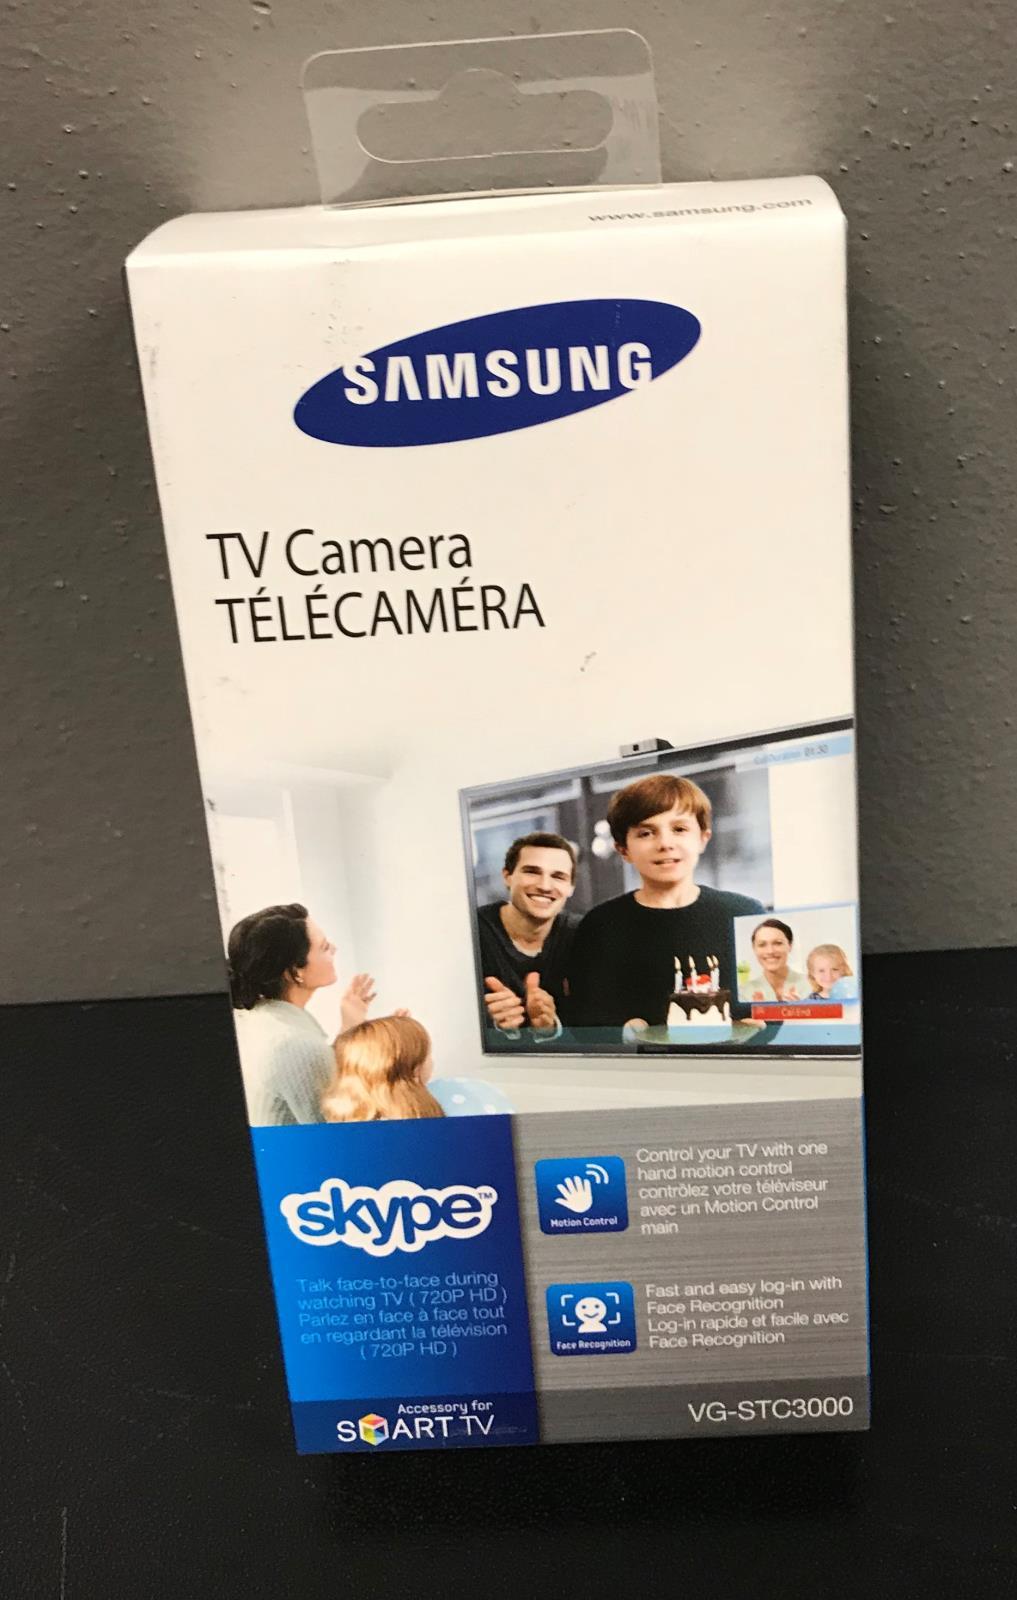 Samsung Vg Stc3000za Tv Camera For Smart Tv New G1 887276017853 Ebay